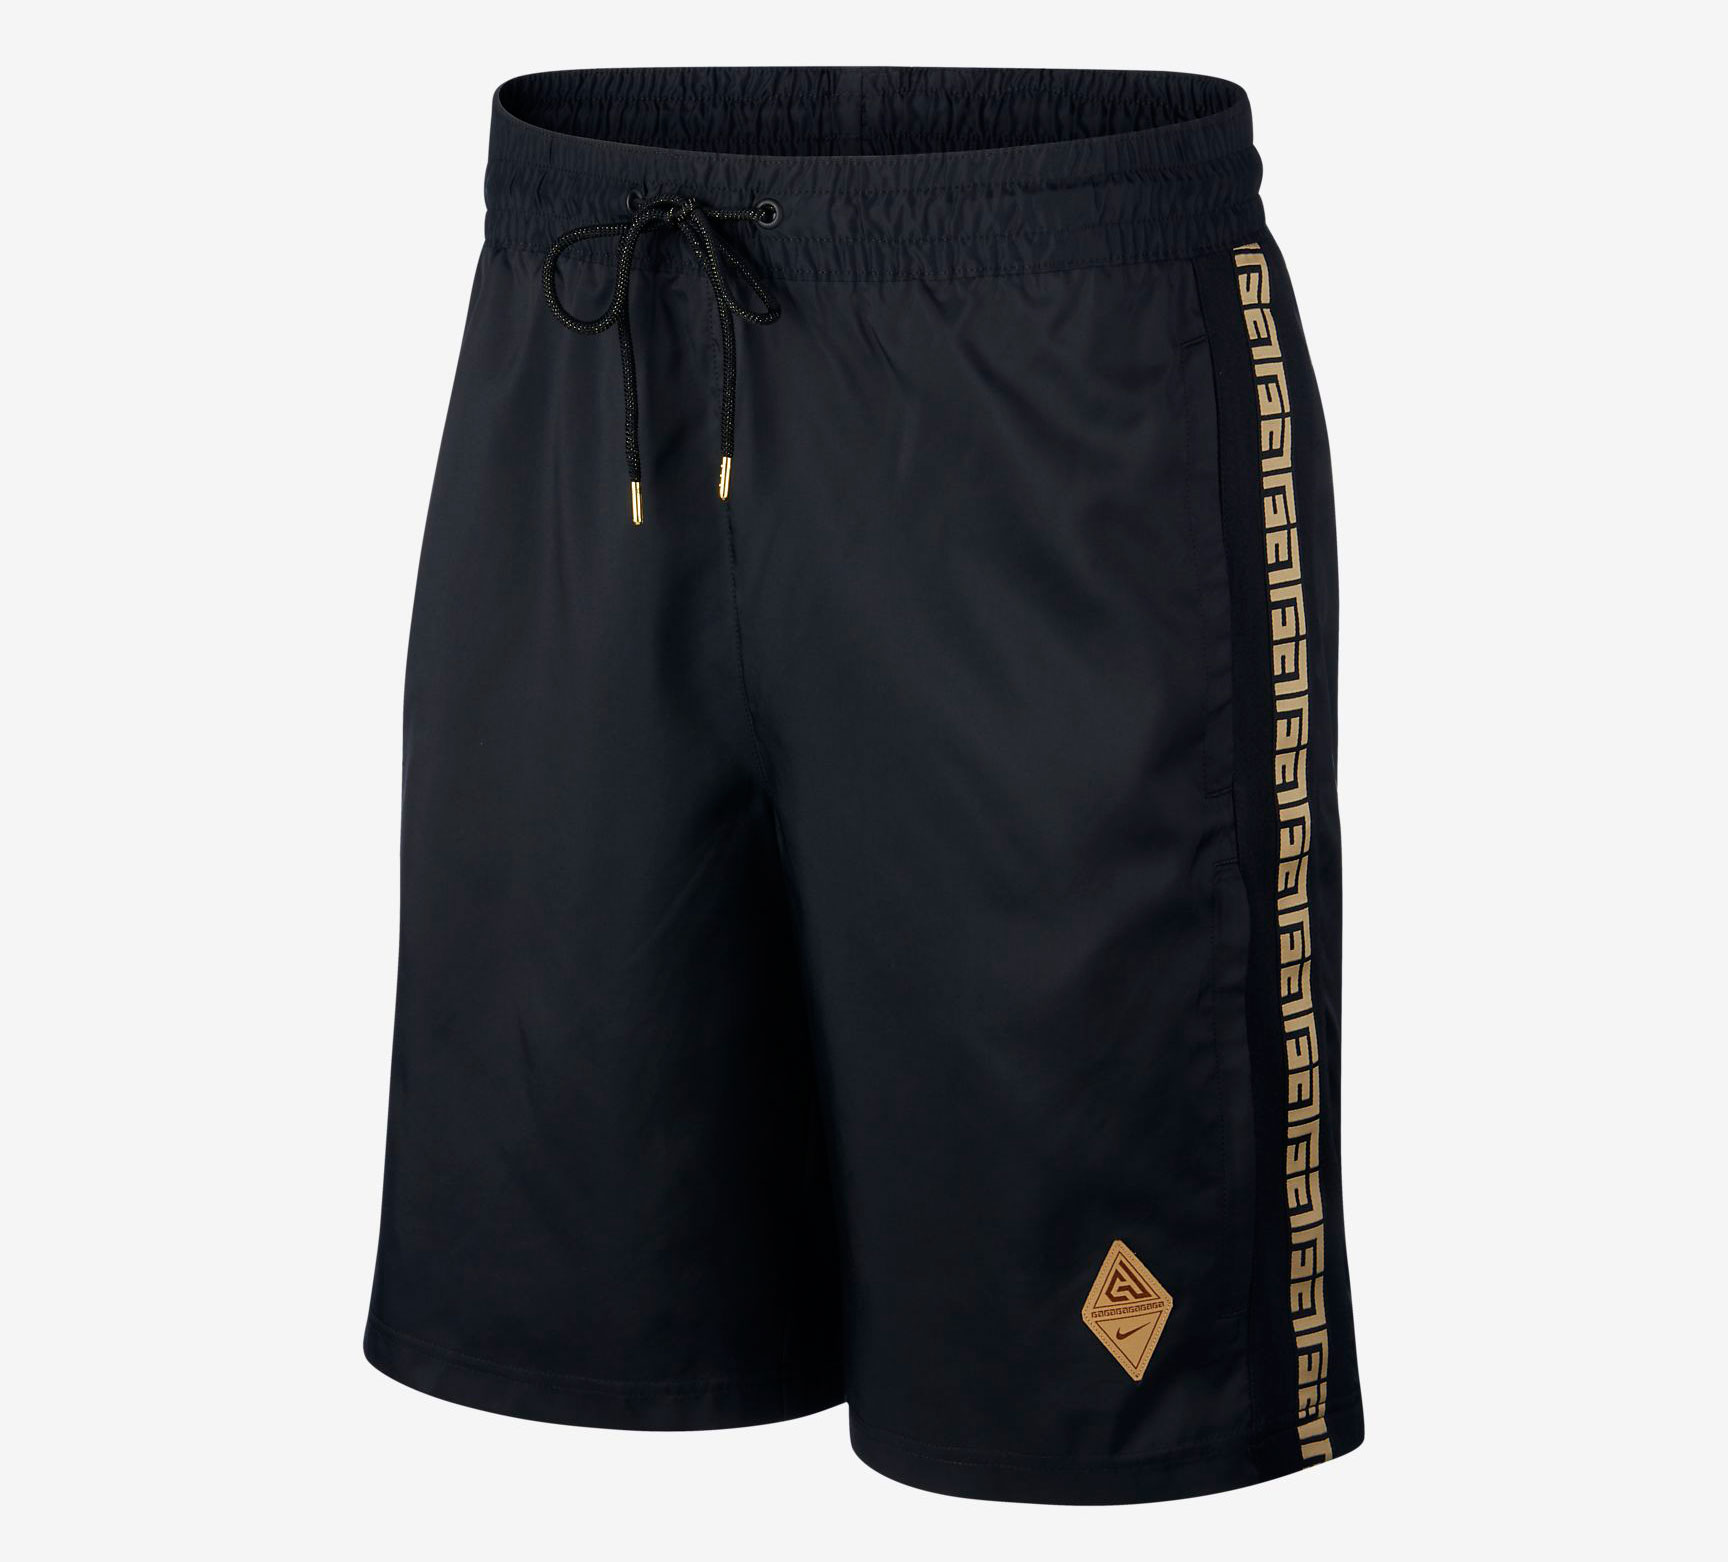 nike-zoom-freak-1-coming-to-america-shorts